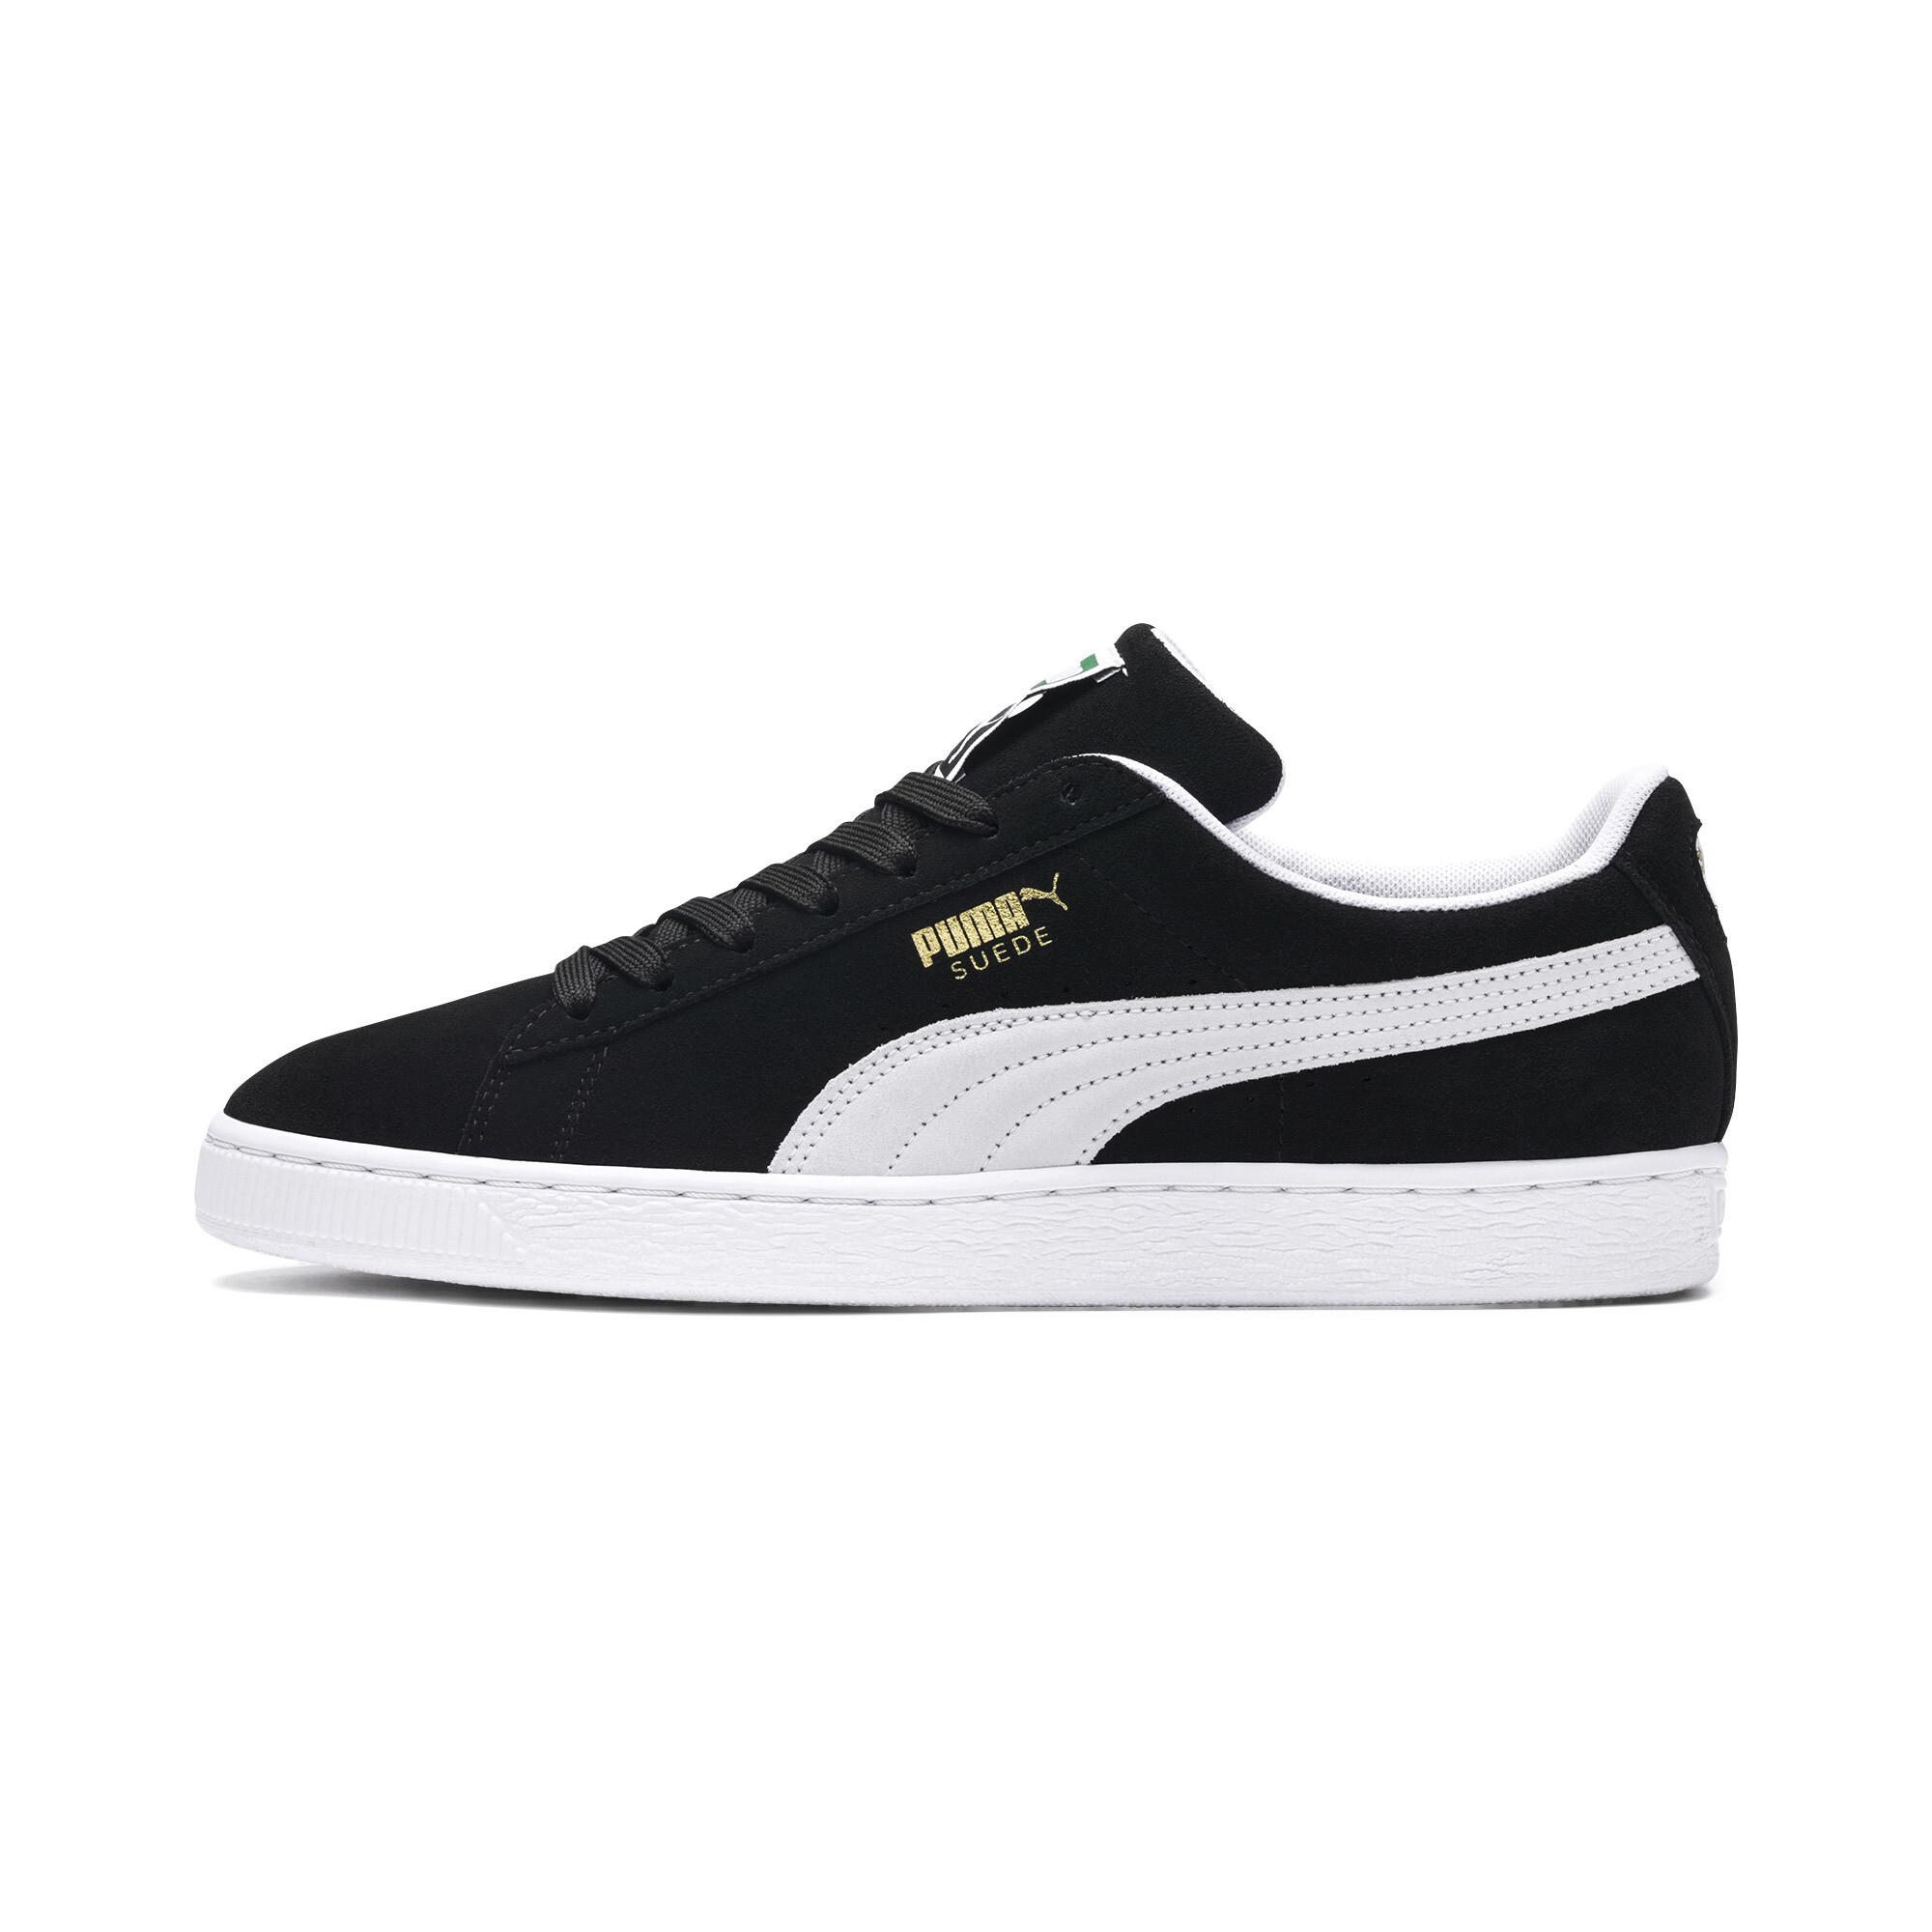 PUMA-Suede-Classic-Sneakers-Men-Shoe-Sport-Shoe thumbnail 7